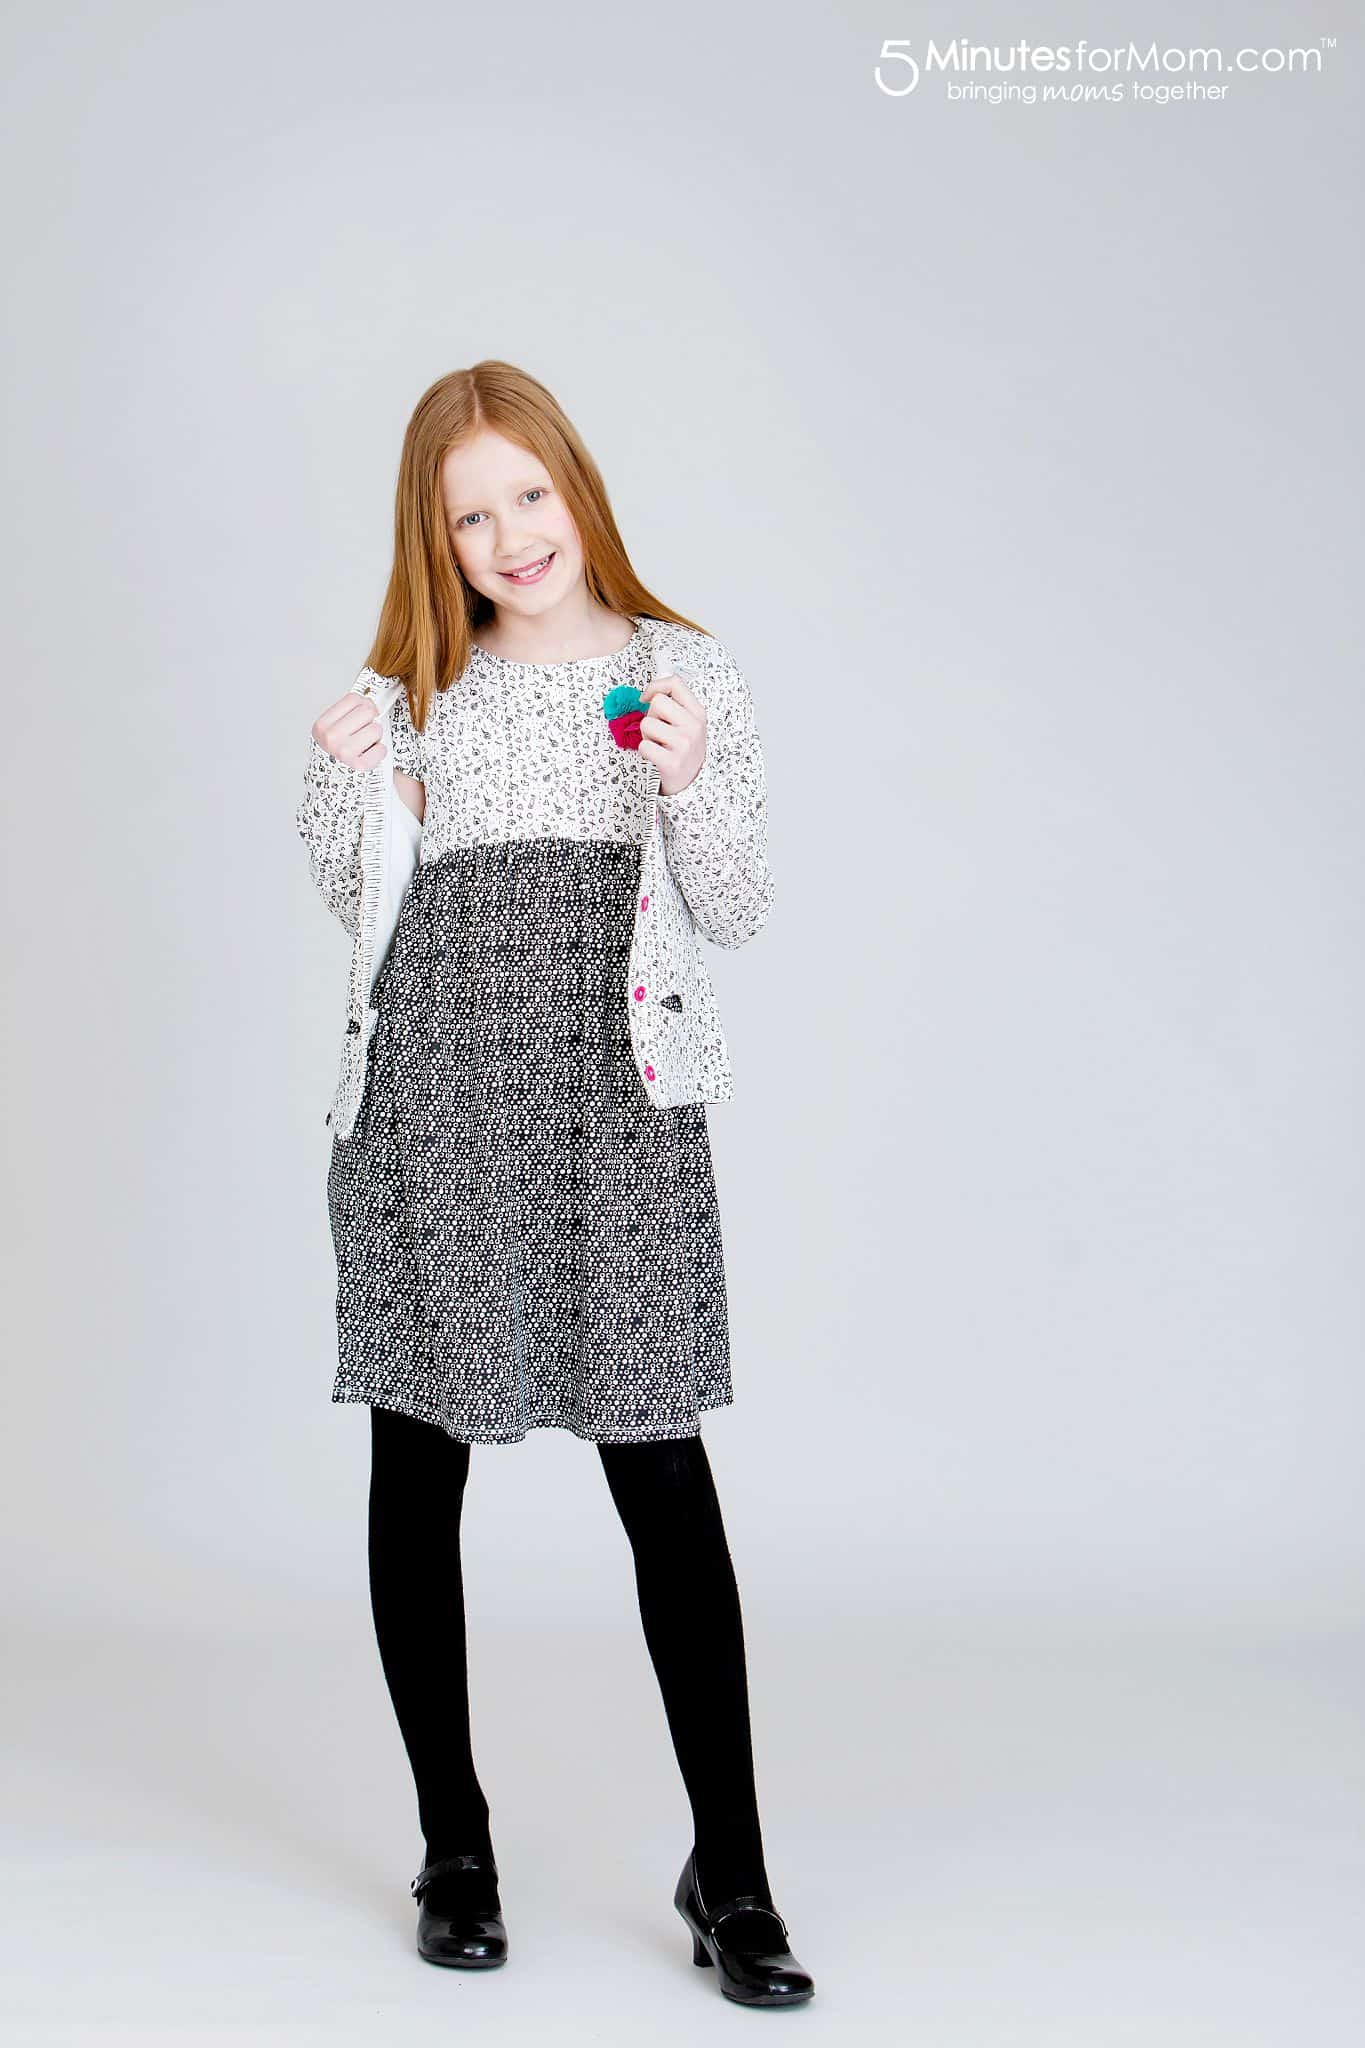 Souris Mini - Stretch Jersey Short Sleeve Dress